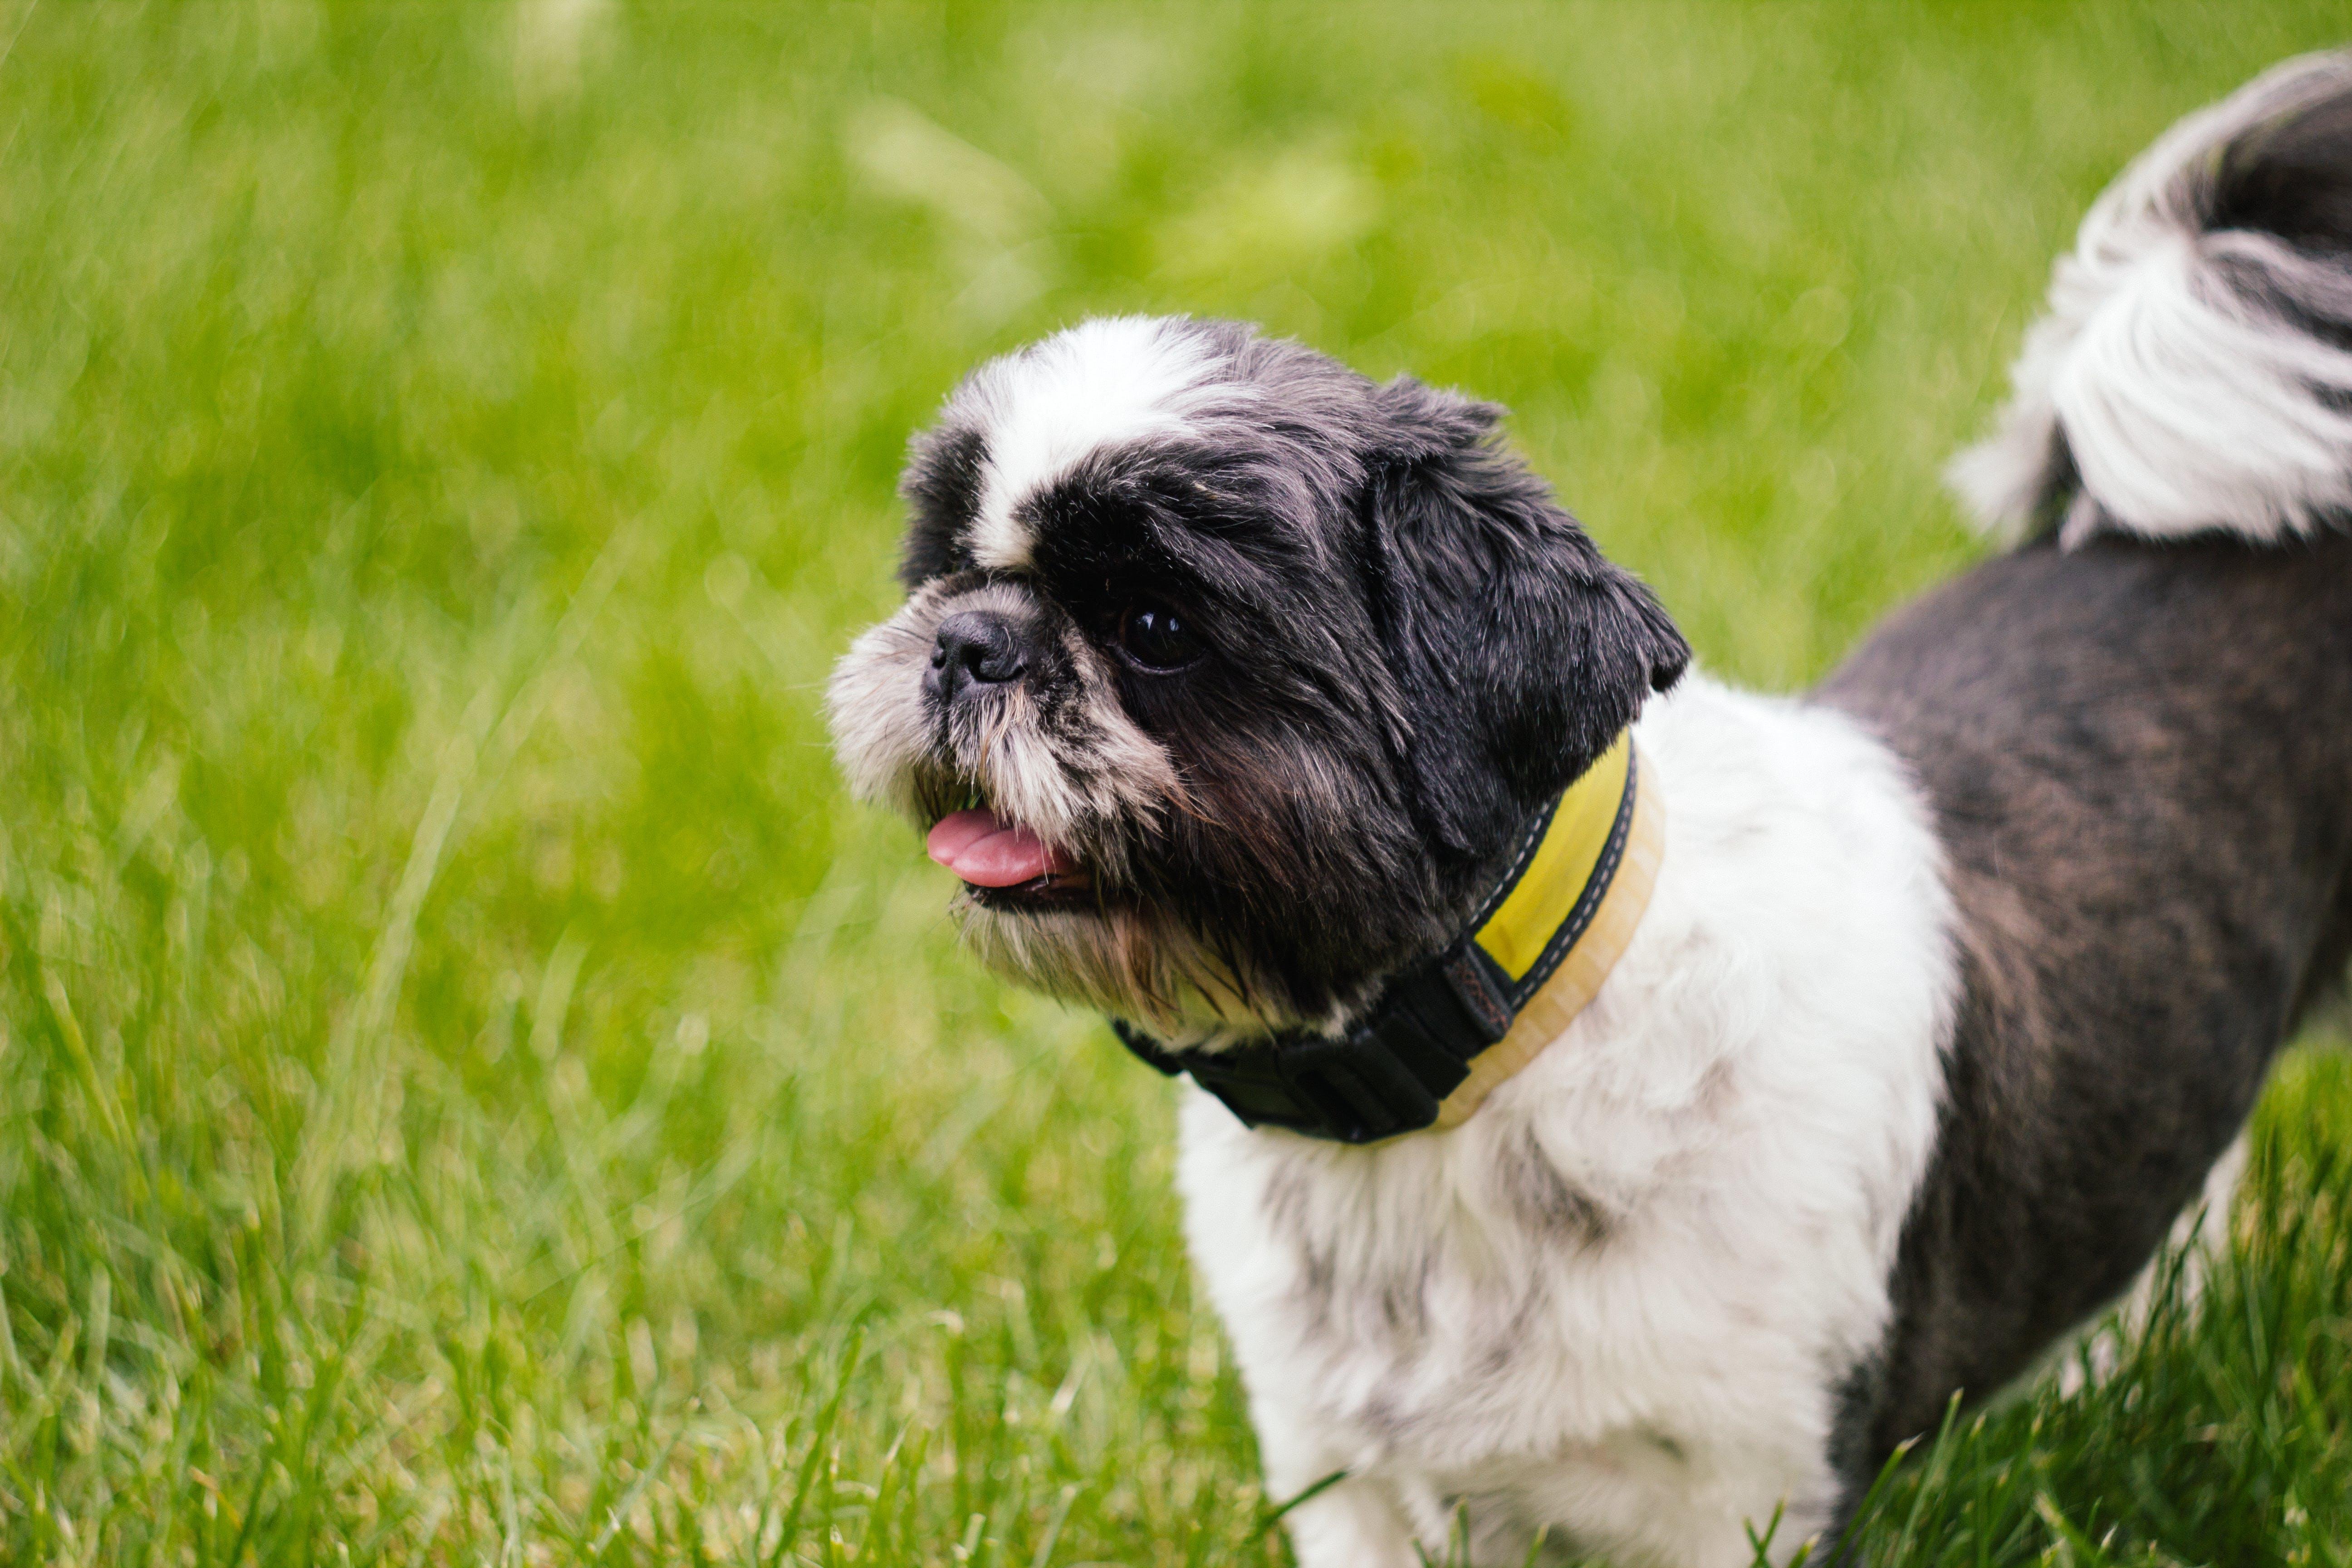 Black and White Short Hair Shih Tzu Dog on Green Grass